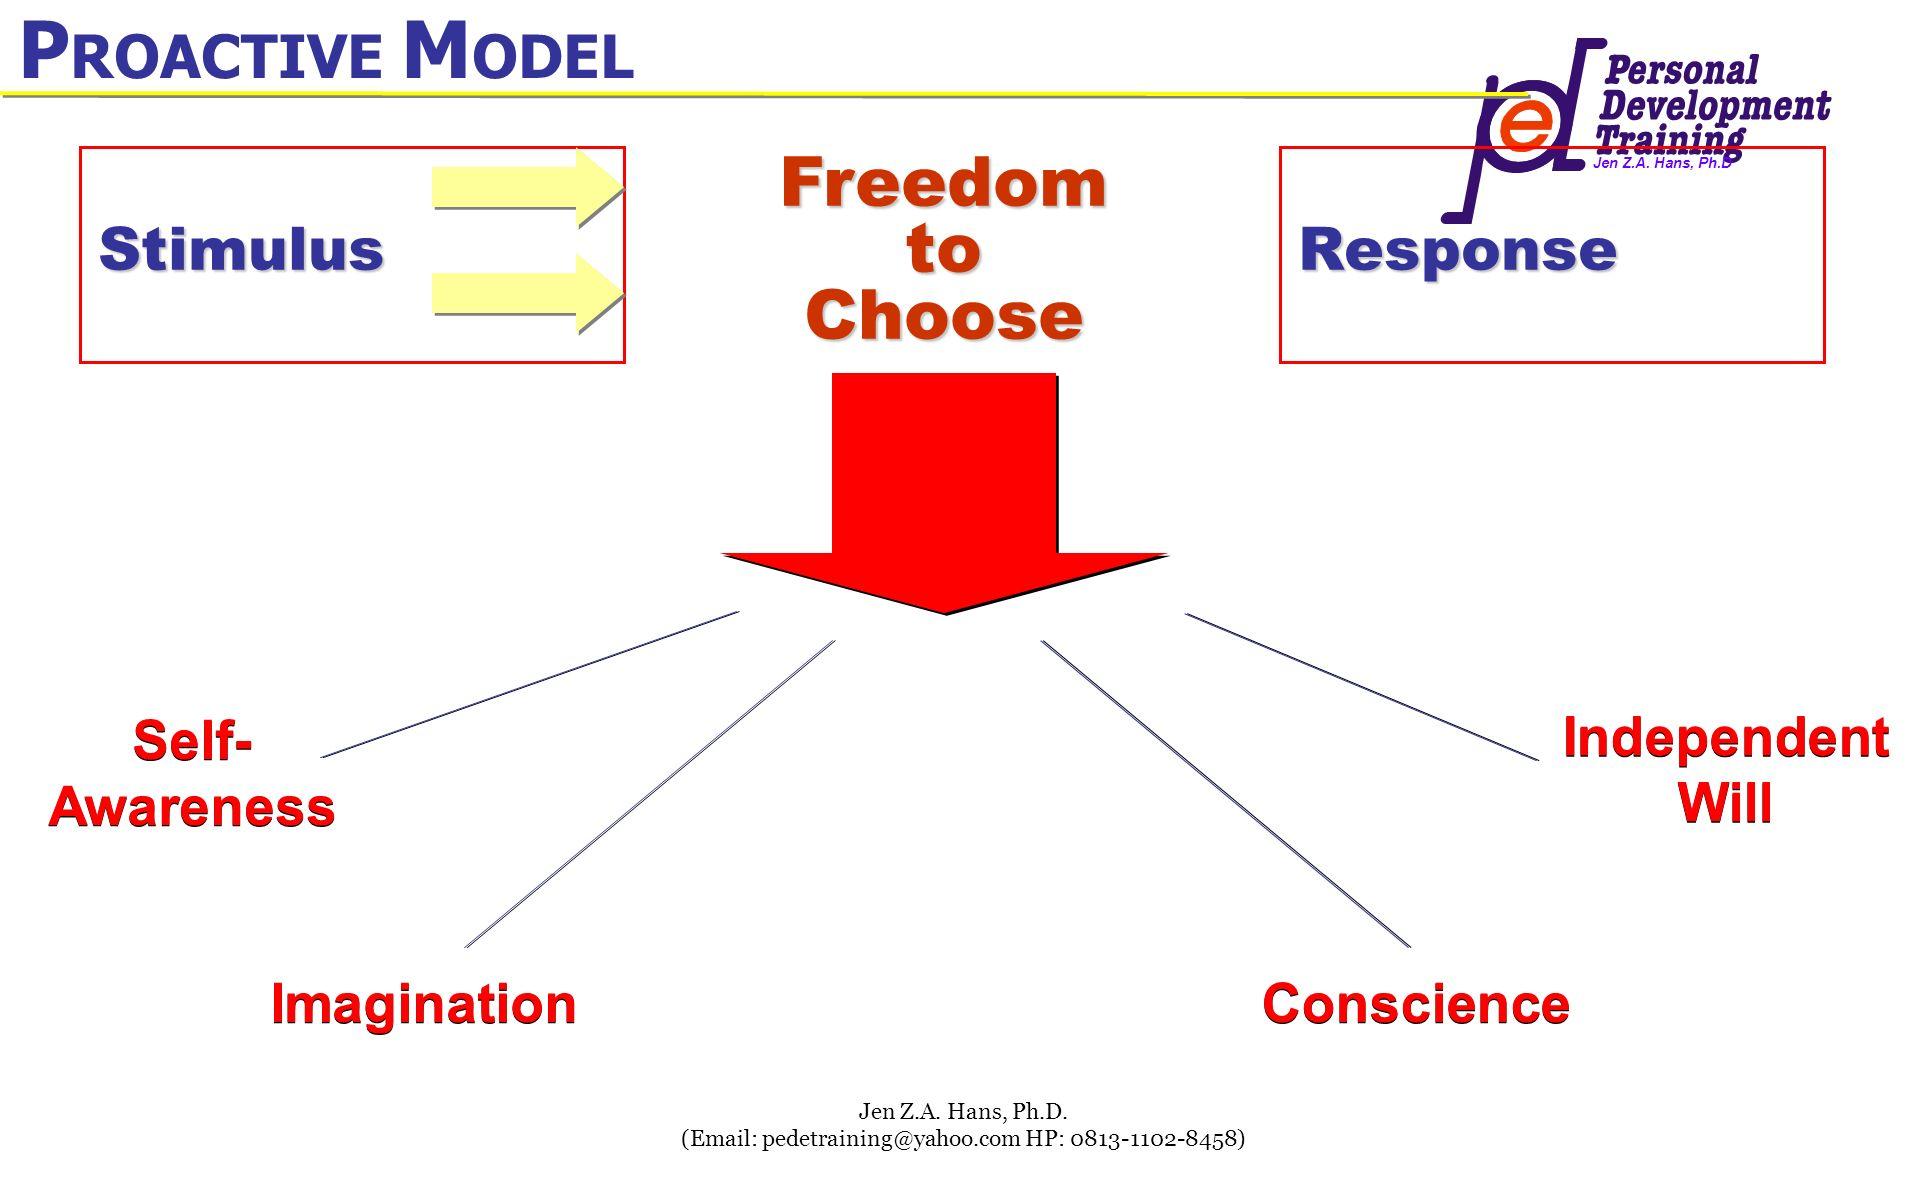 Jen Z.A. Hans, Ph.D Jen Z.A. Hans, Ph.D. (Email: pedetraining@yahoo.com HP: 0813-1102-8458) P ROACTIVE M ODEL P ROACTIVE M ODEL StimulusResponse Freed